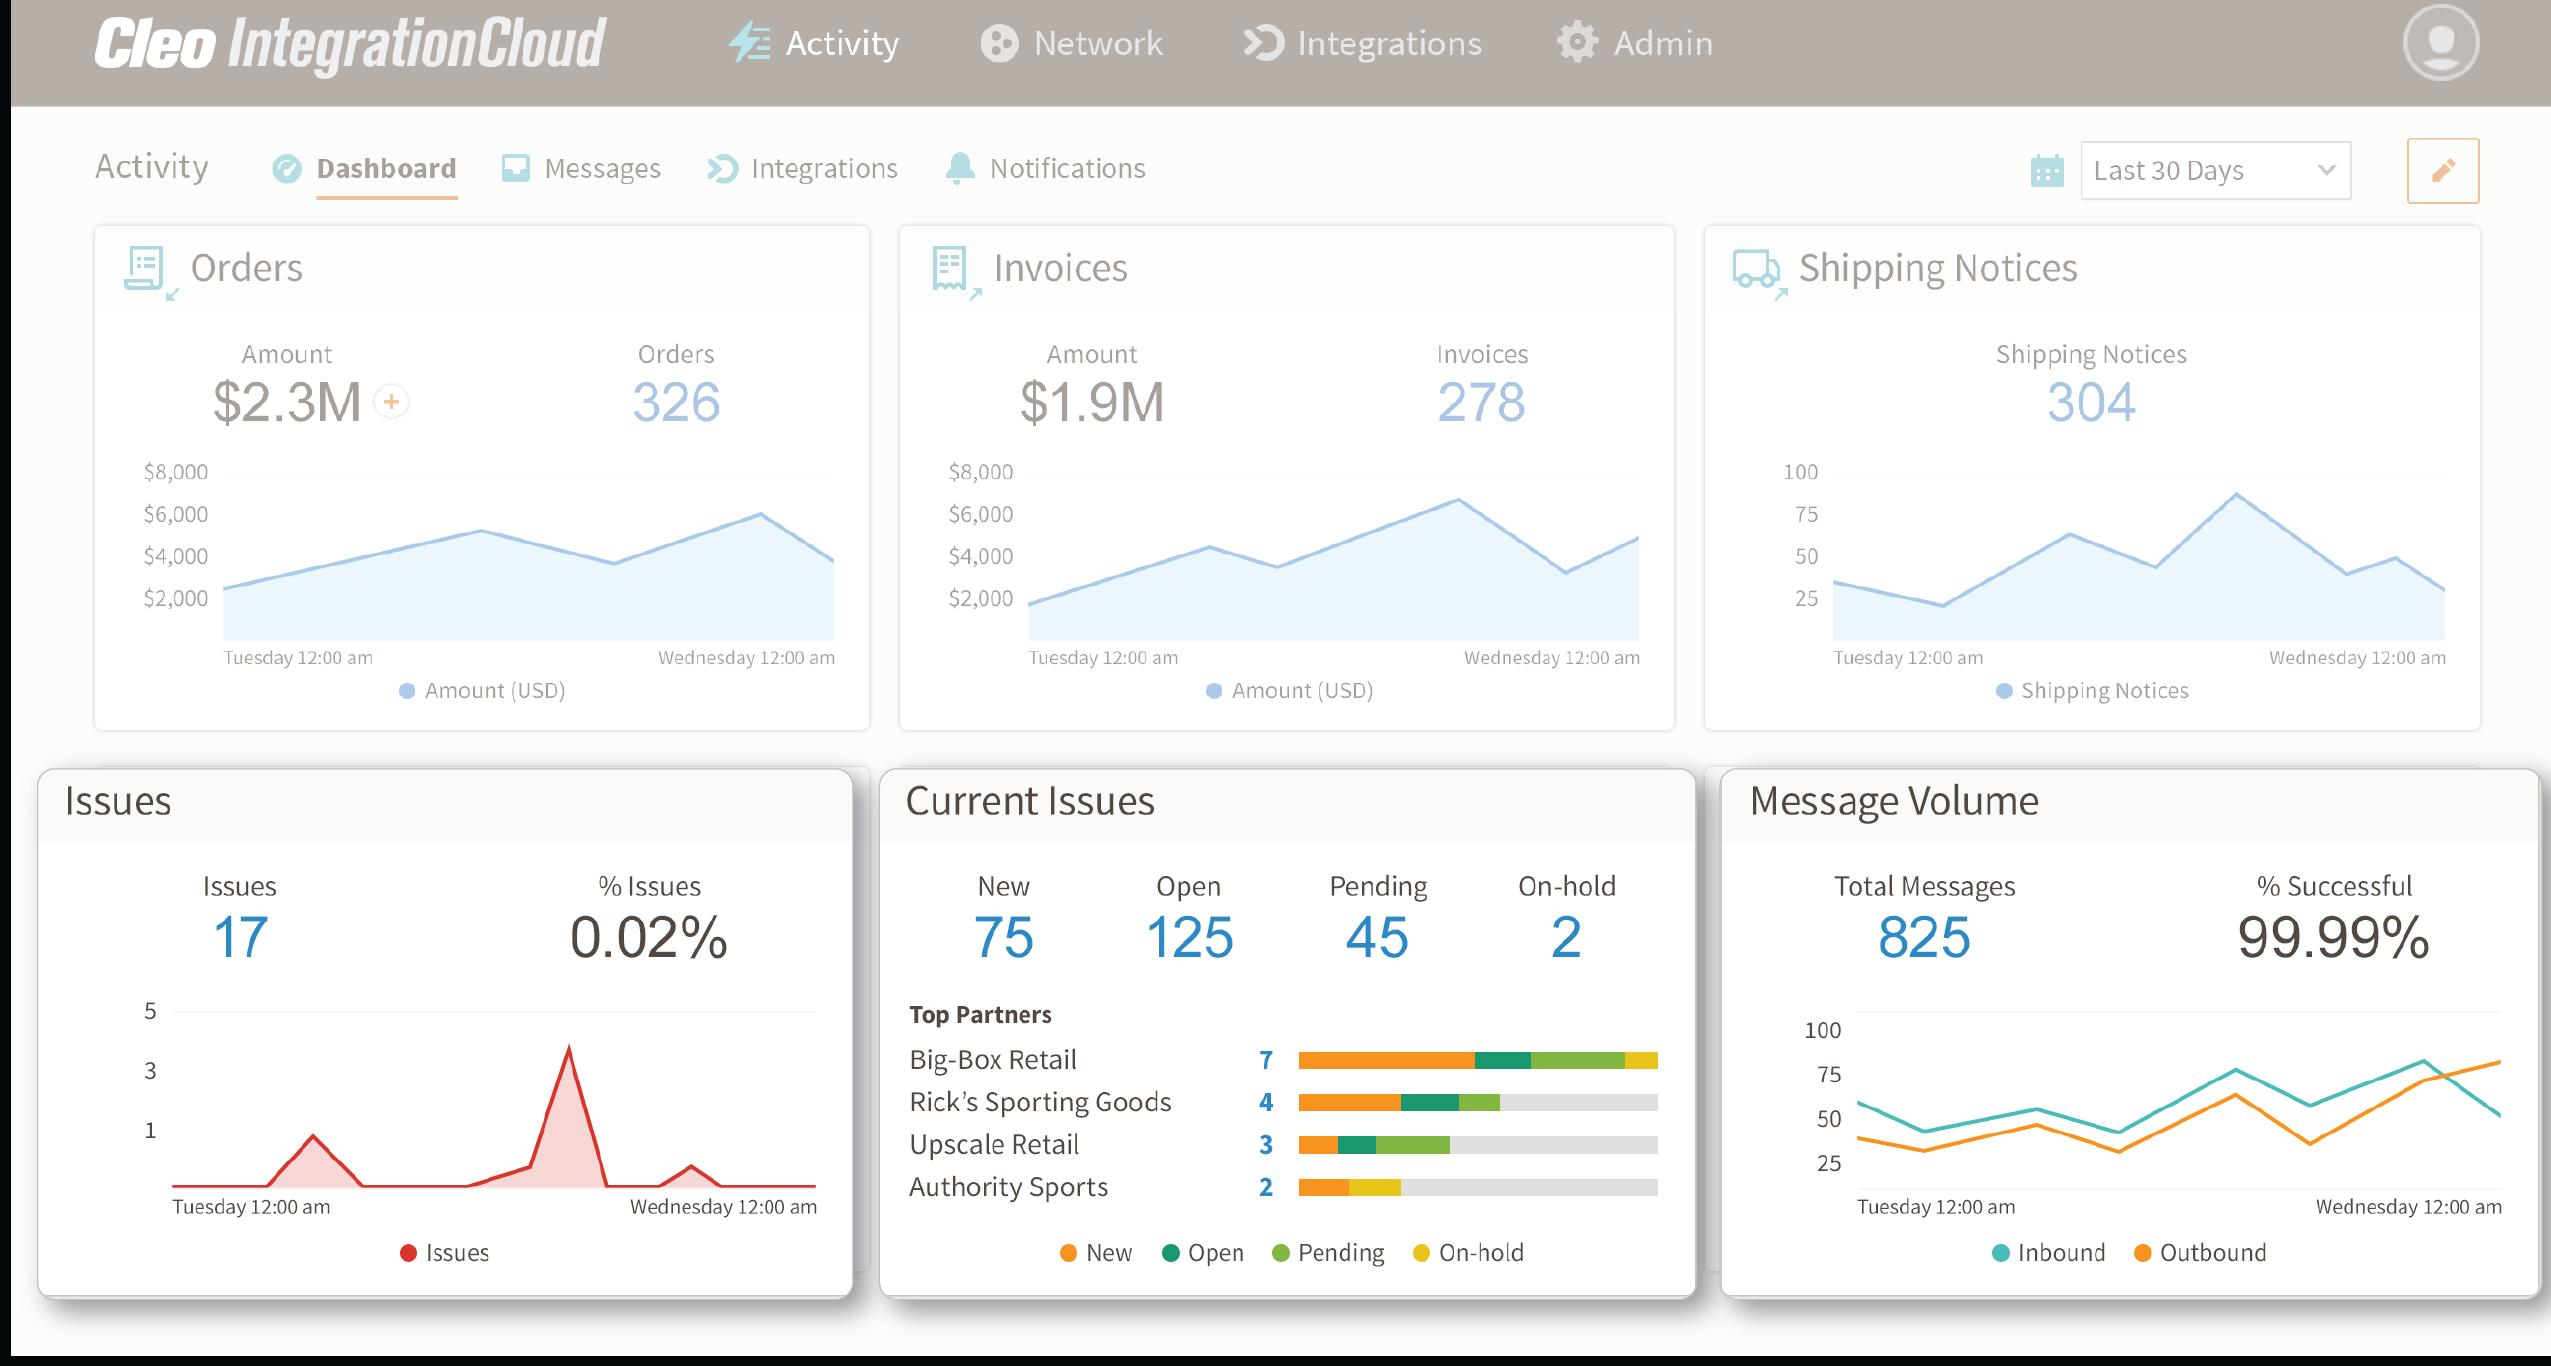 Cleo Integration Cloud dashboard